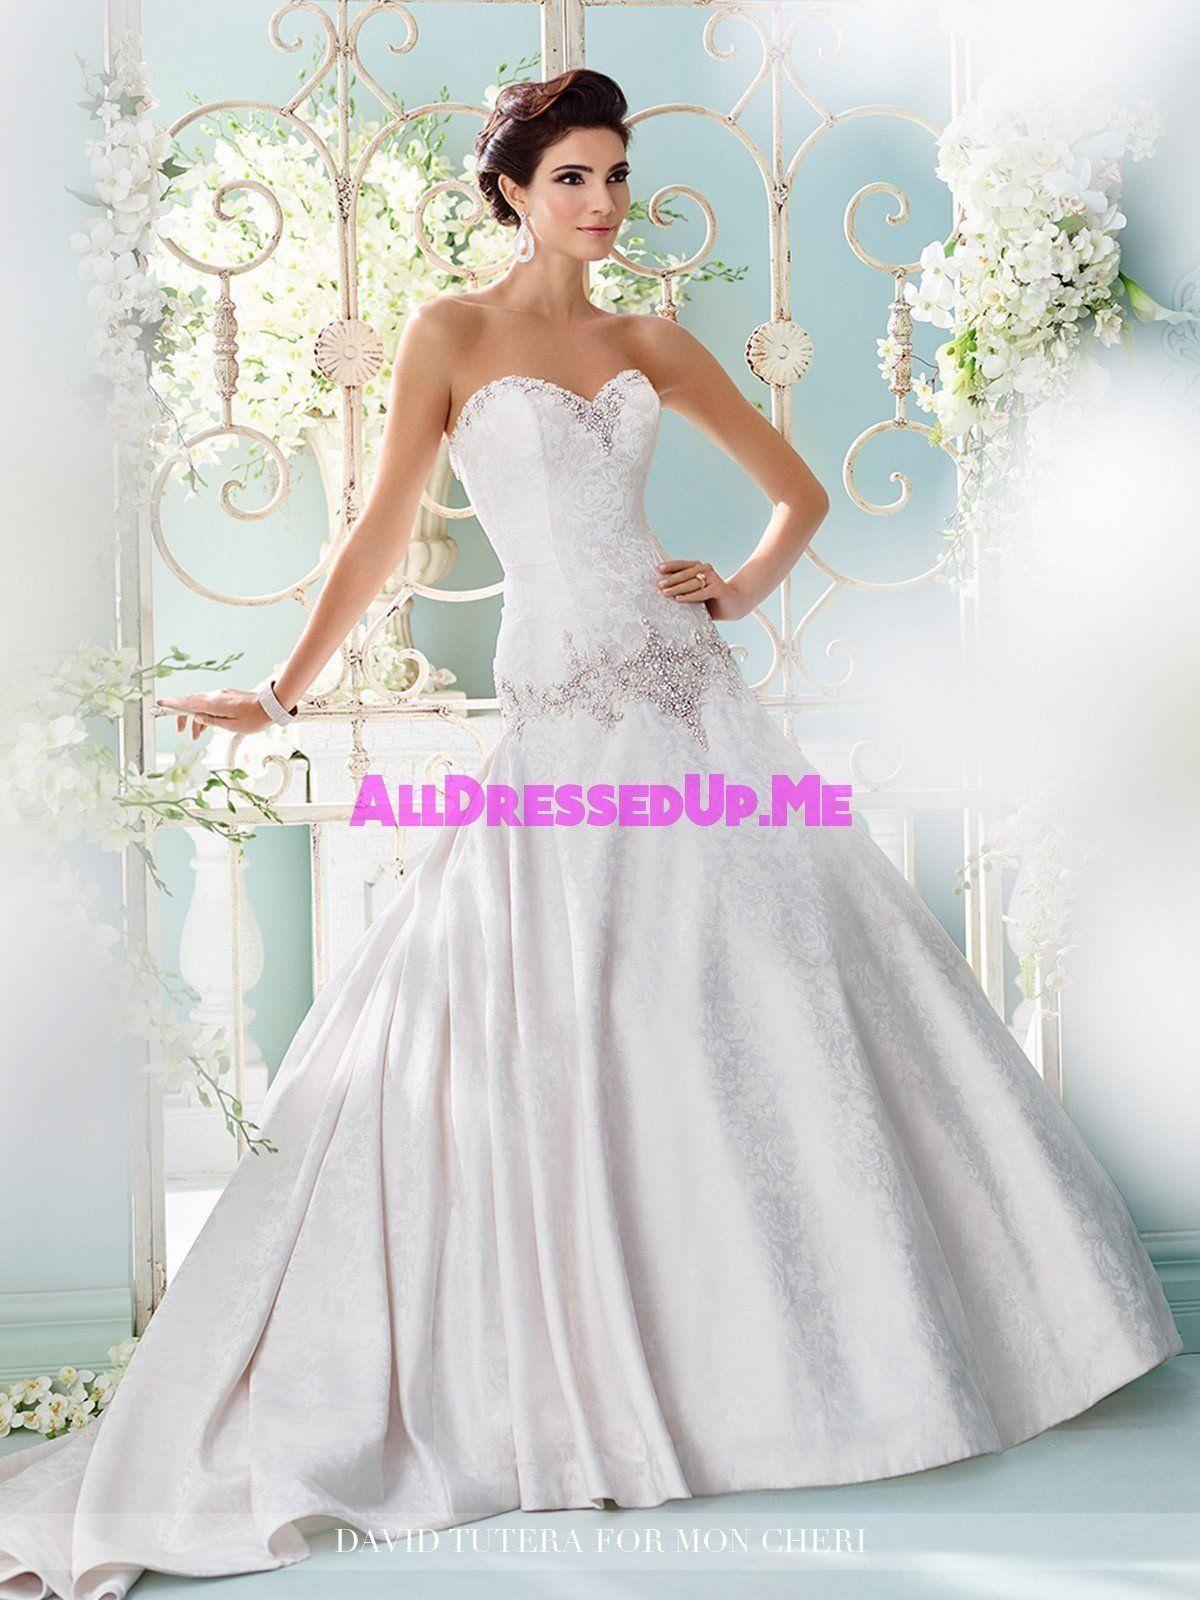 David Tutera Cyan 216243 All Dressed Up Bridal Gown Mon Cheri Wedding Gowns Dresses Chattanooga Hixson S Boutiques Tennessee Tn Georgia Ga